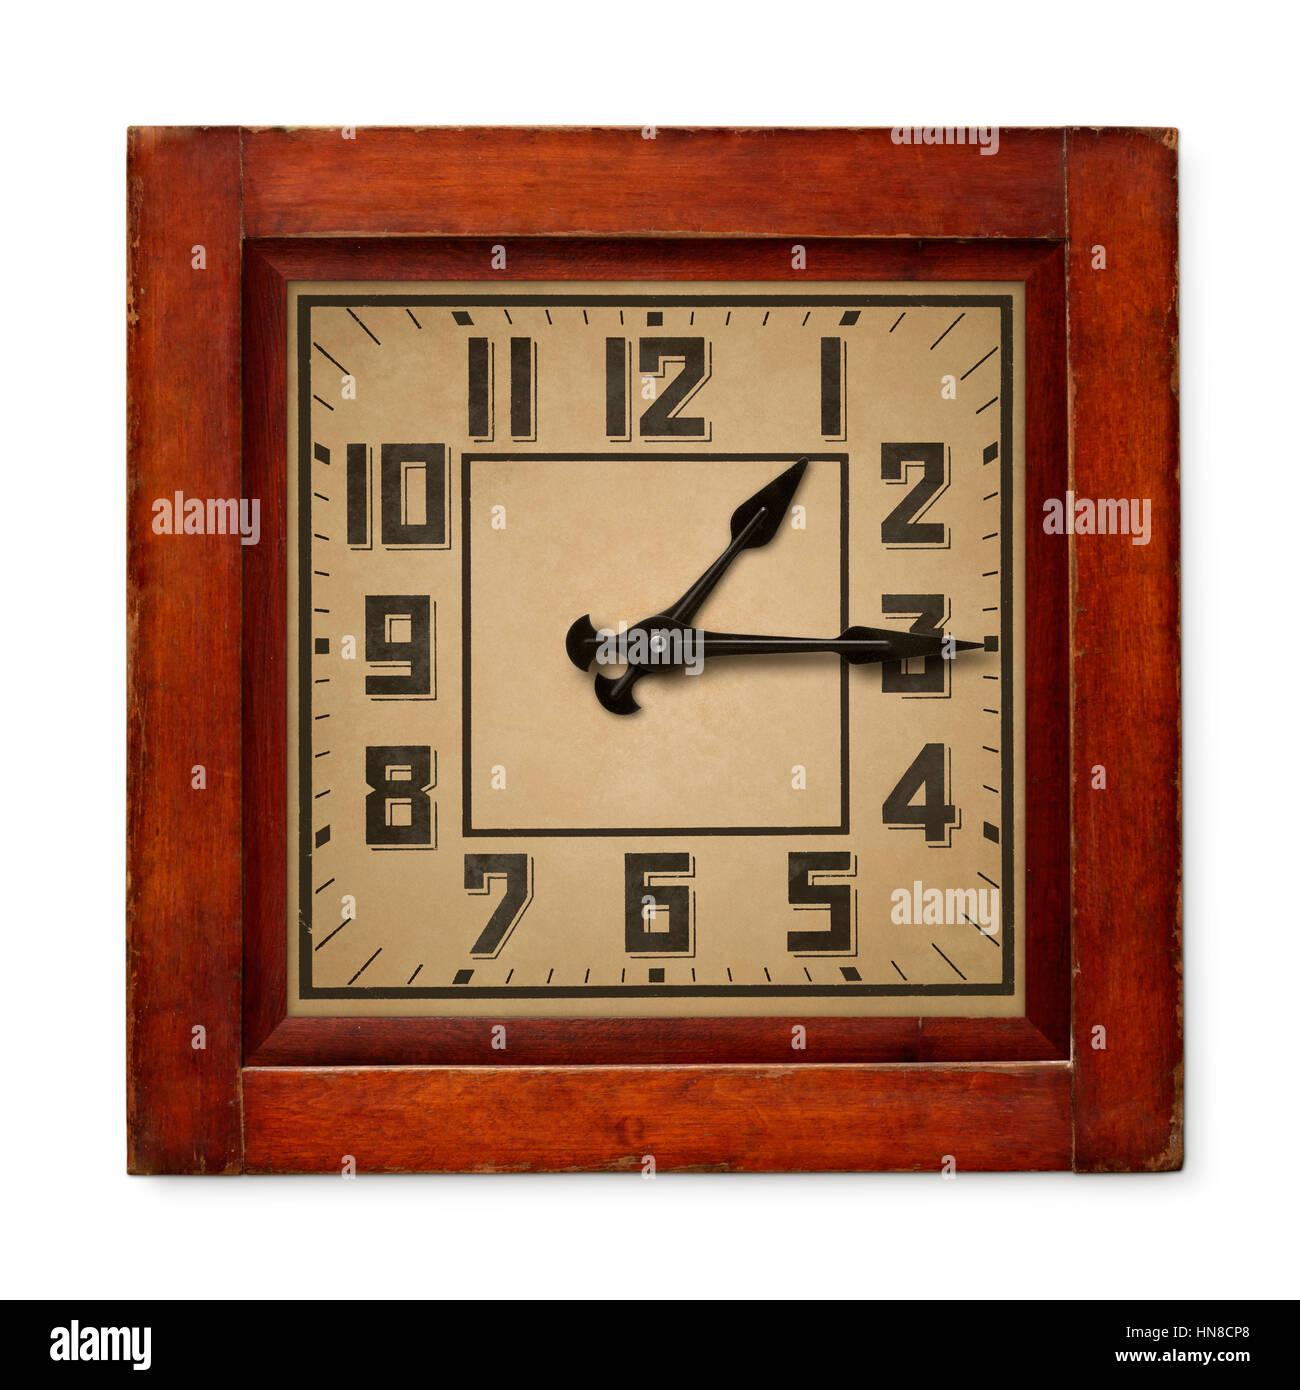 objets isol s vieille horloge murale en bois carr isol sur fond blanc banque d 39 images. Black Bedroom Furniture Sets. Home Design Ideas